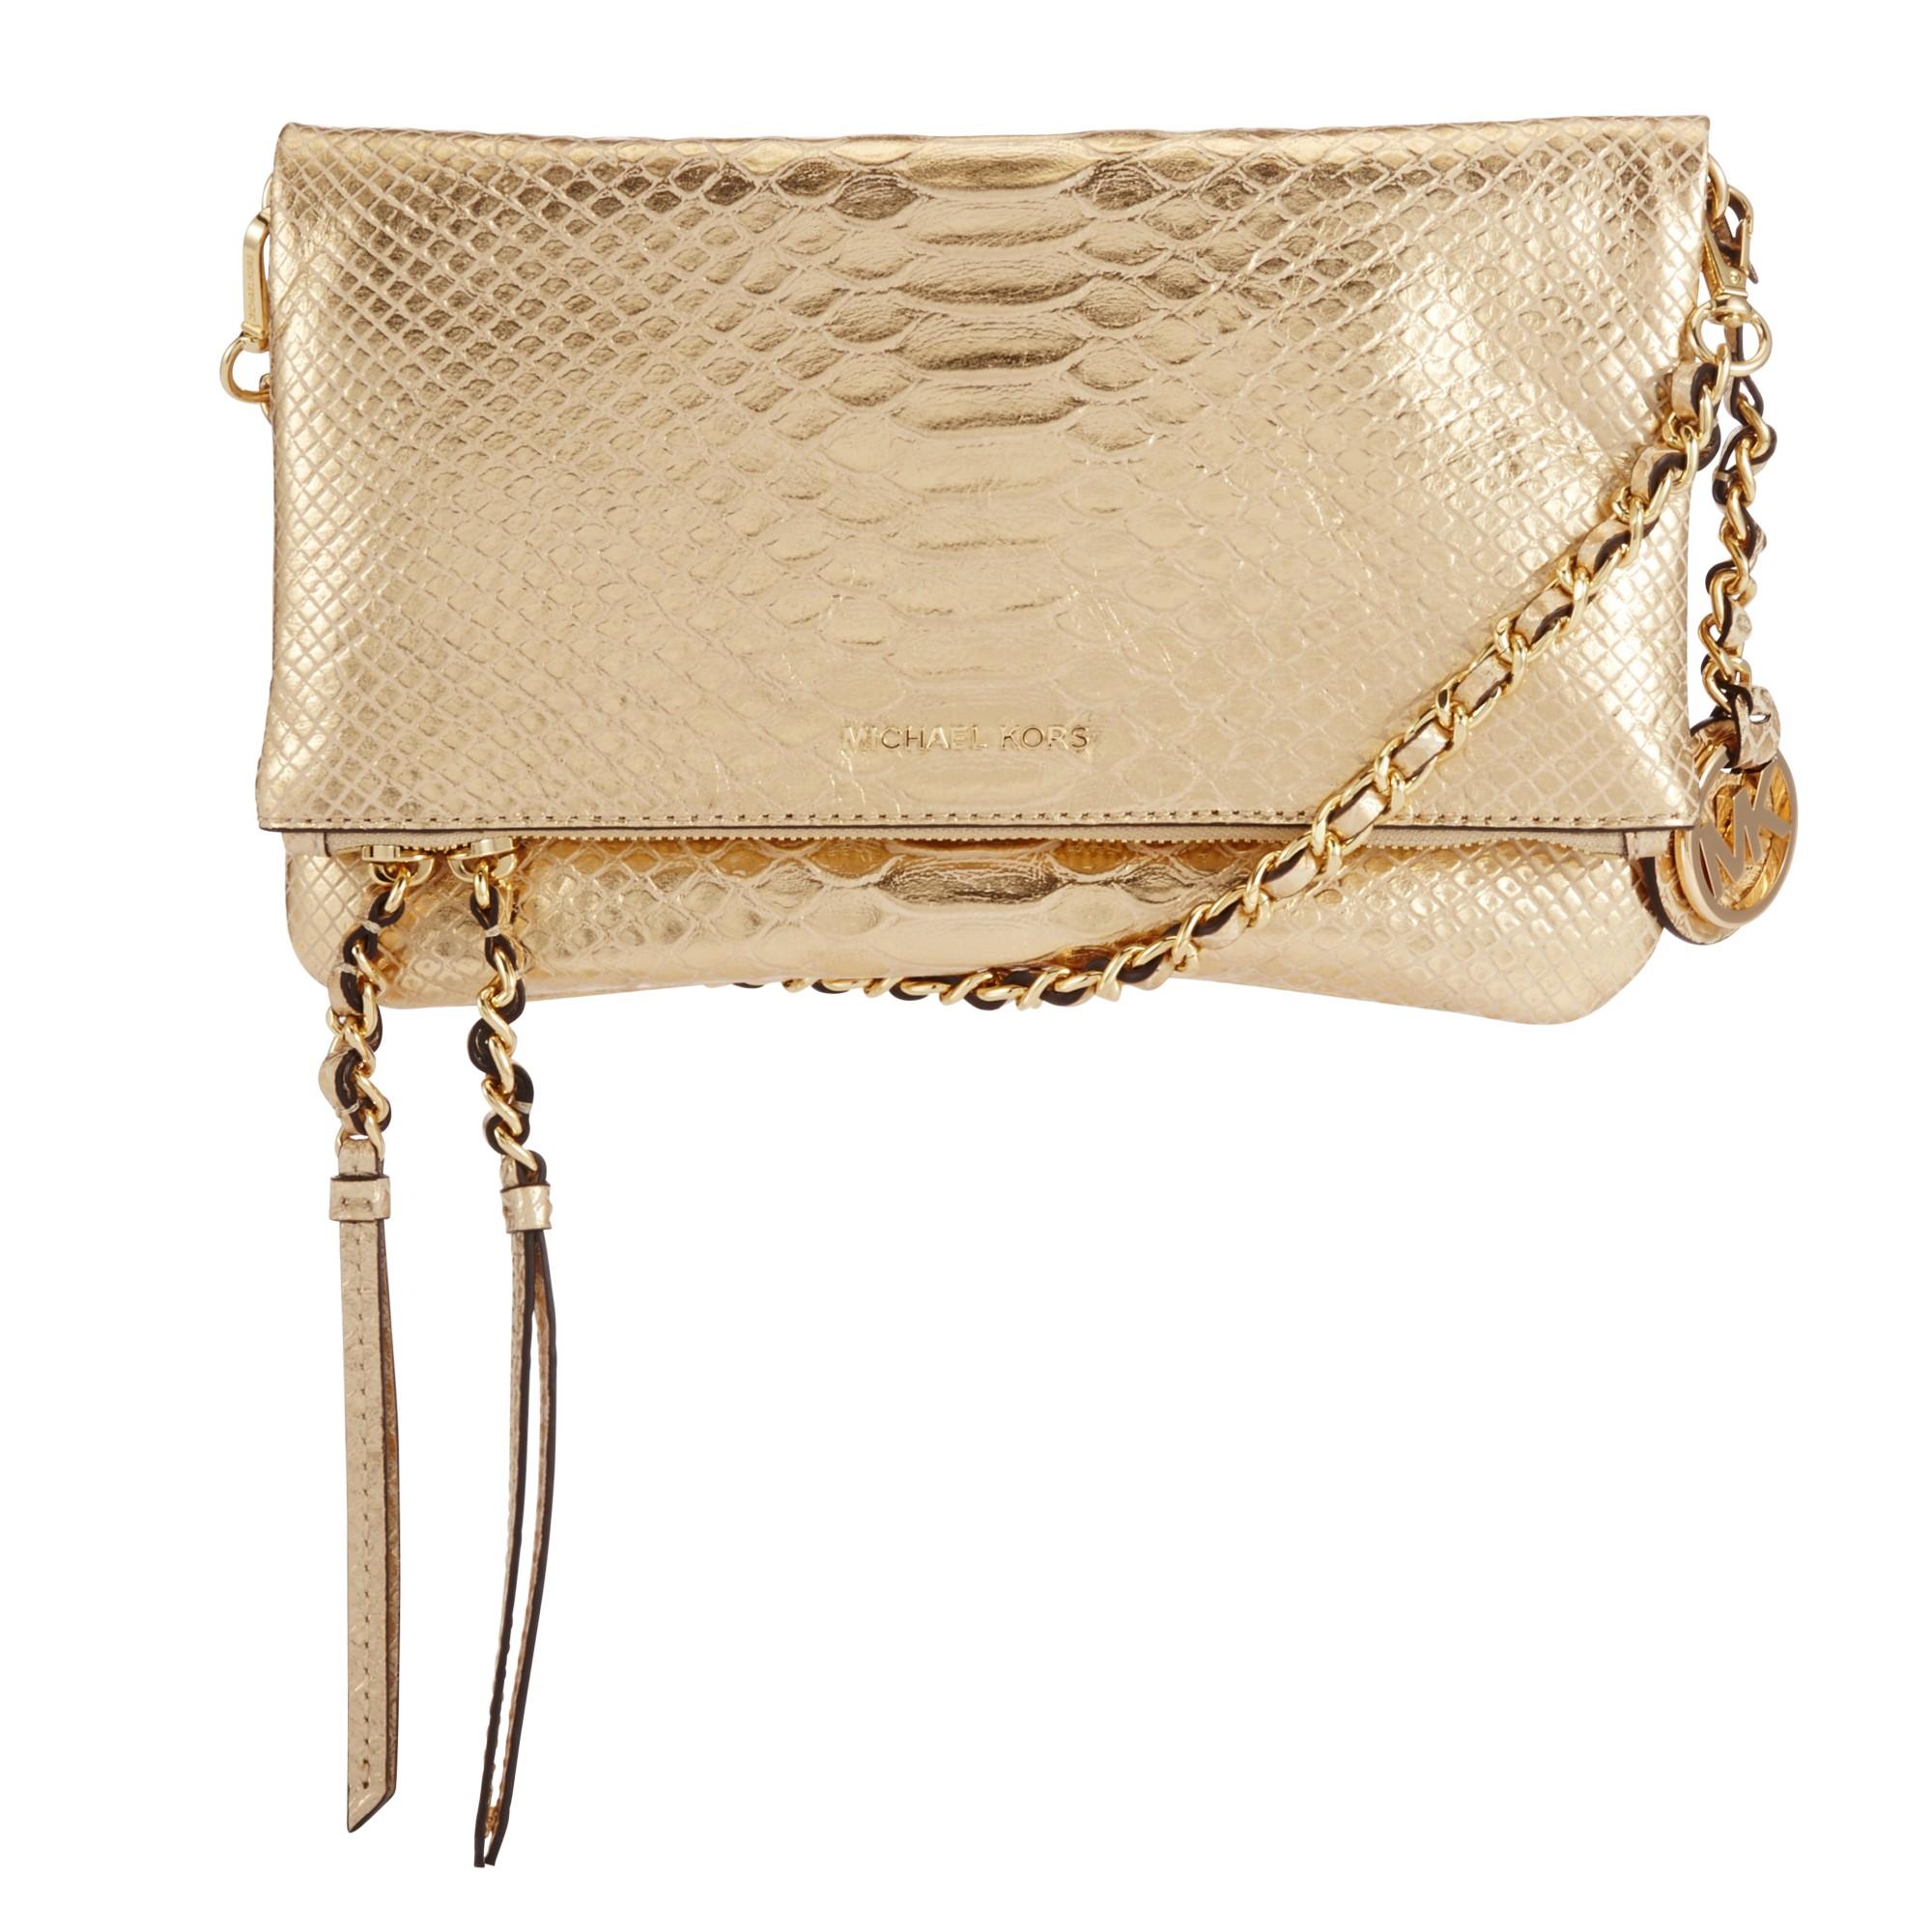 b98b43901f95 MICHAEL Michael Kors Corinne Medium Leather Messenger Bag in Natural ...